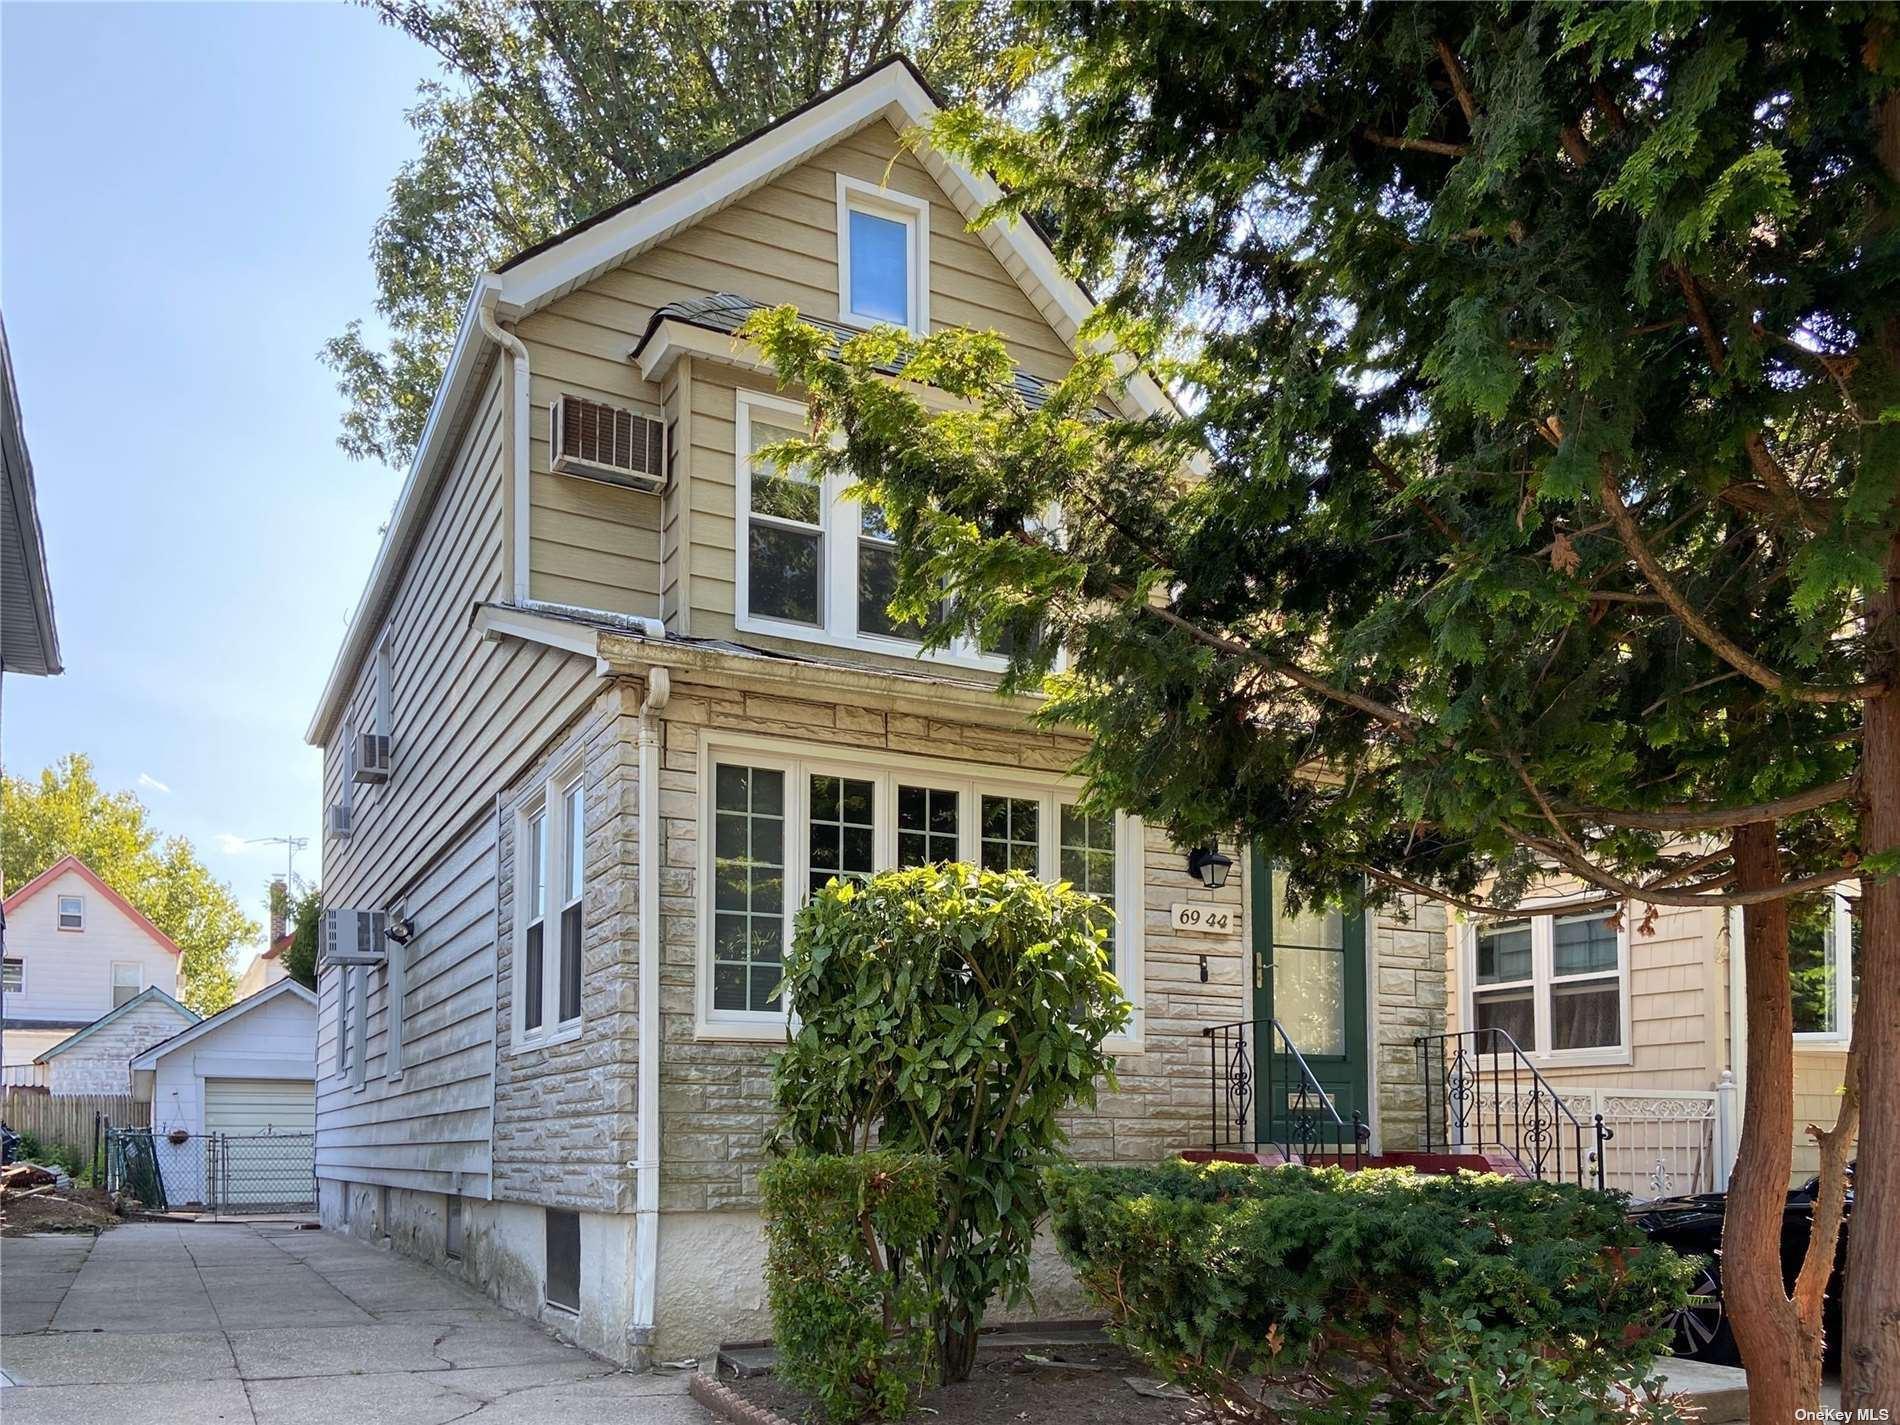 69-44 Nansen Street, Forest Hills, NY 11375 - MLS#: 3347544